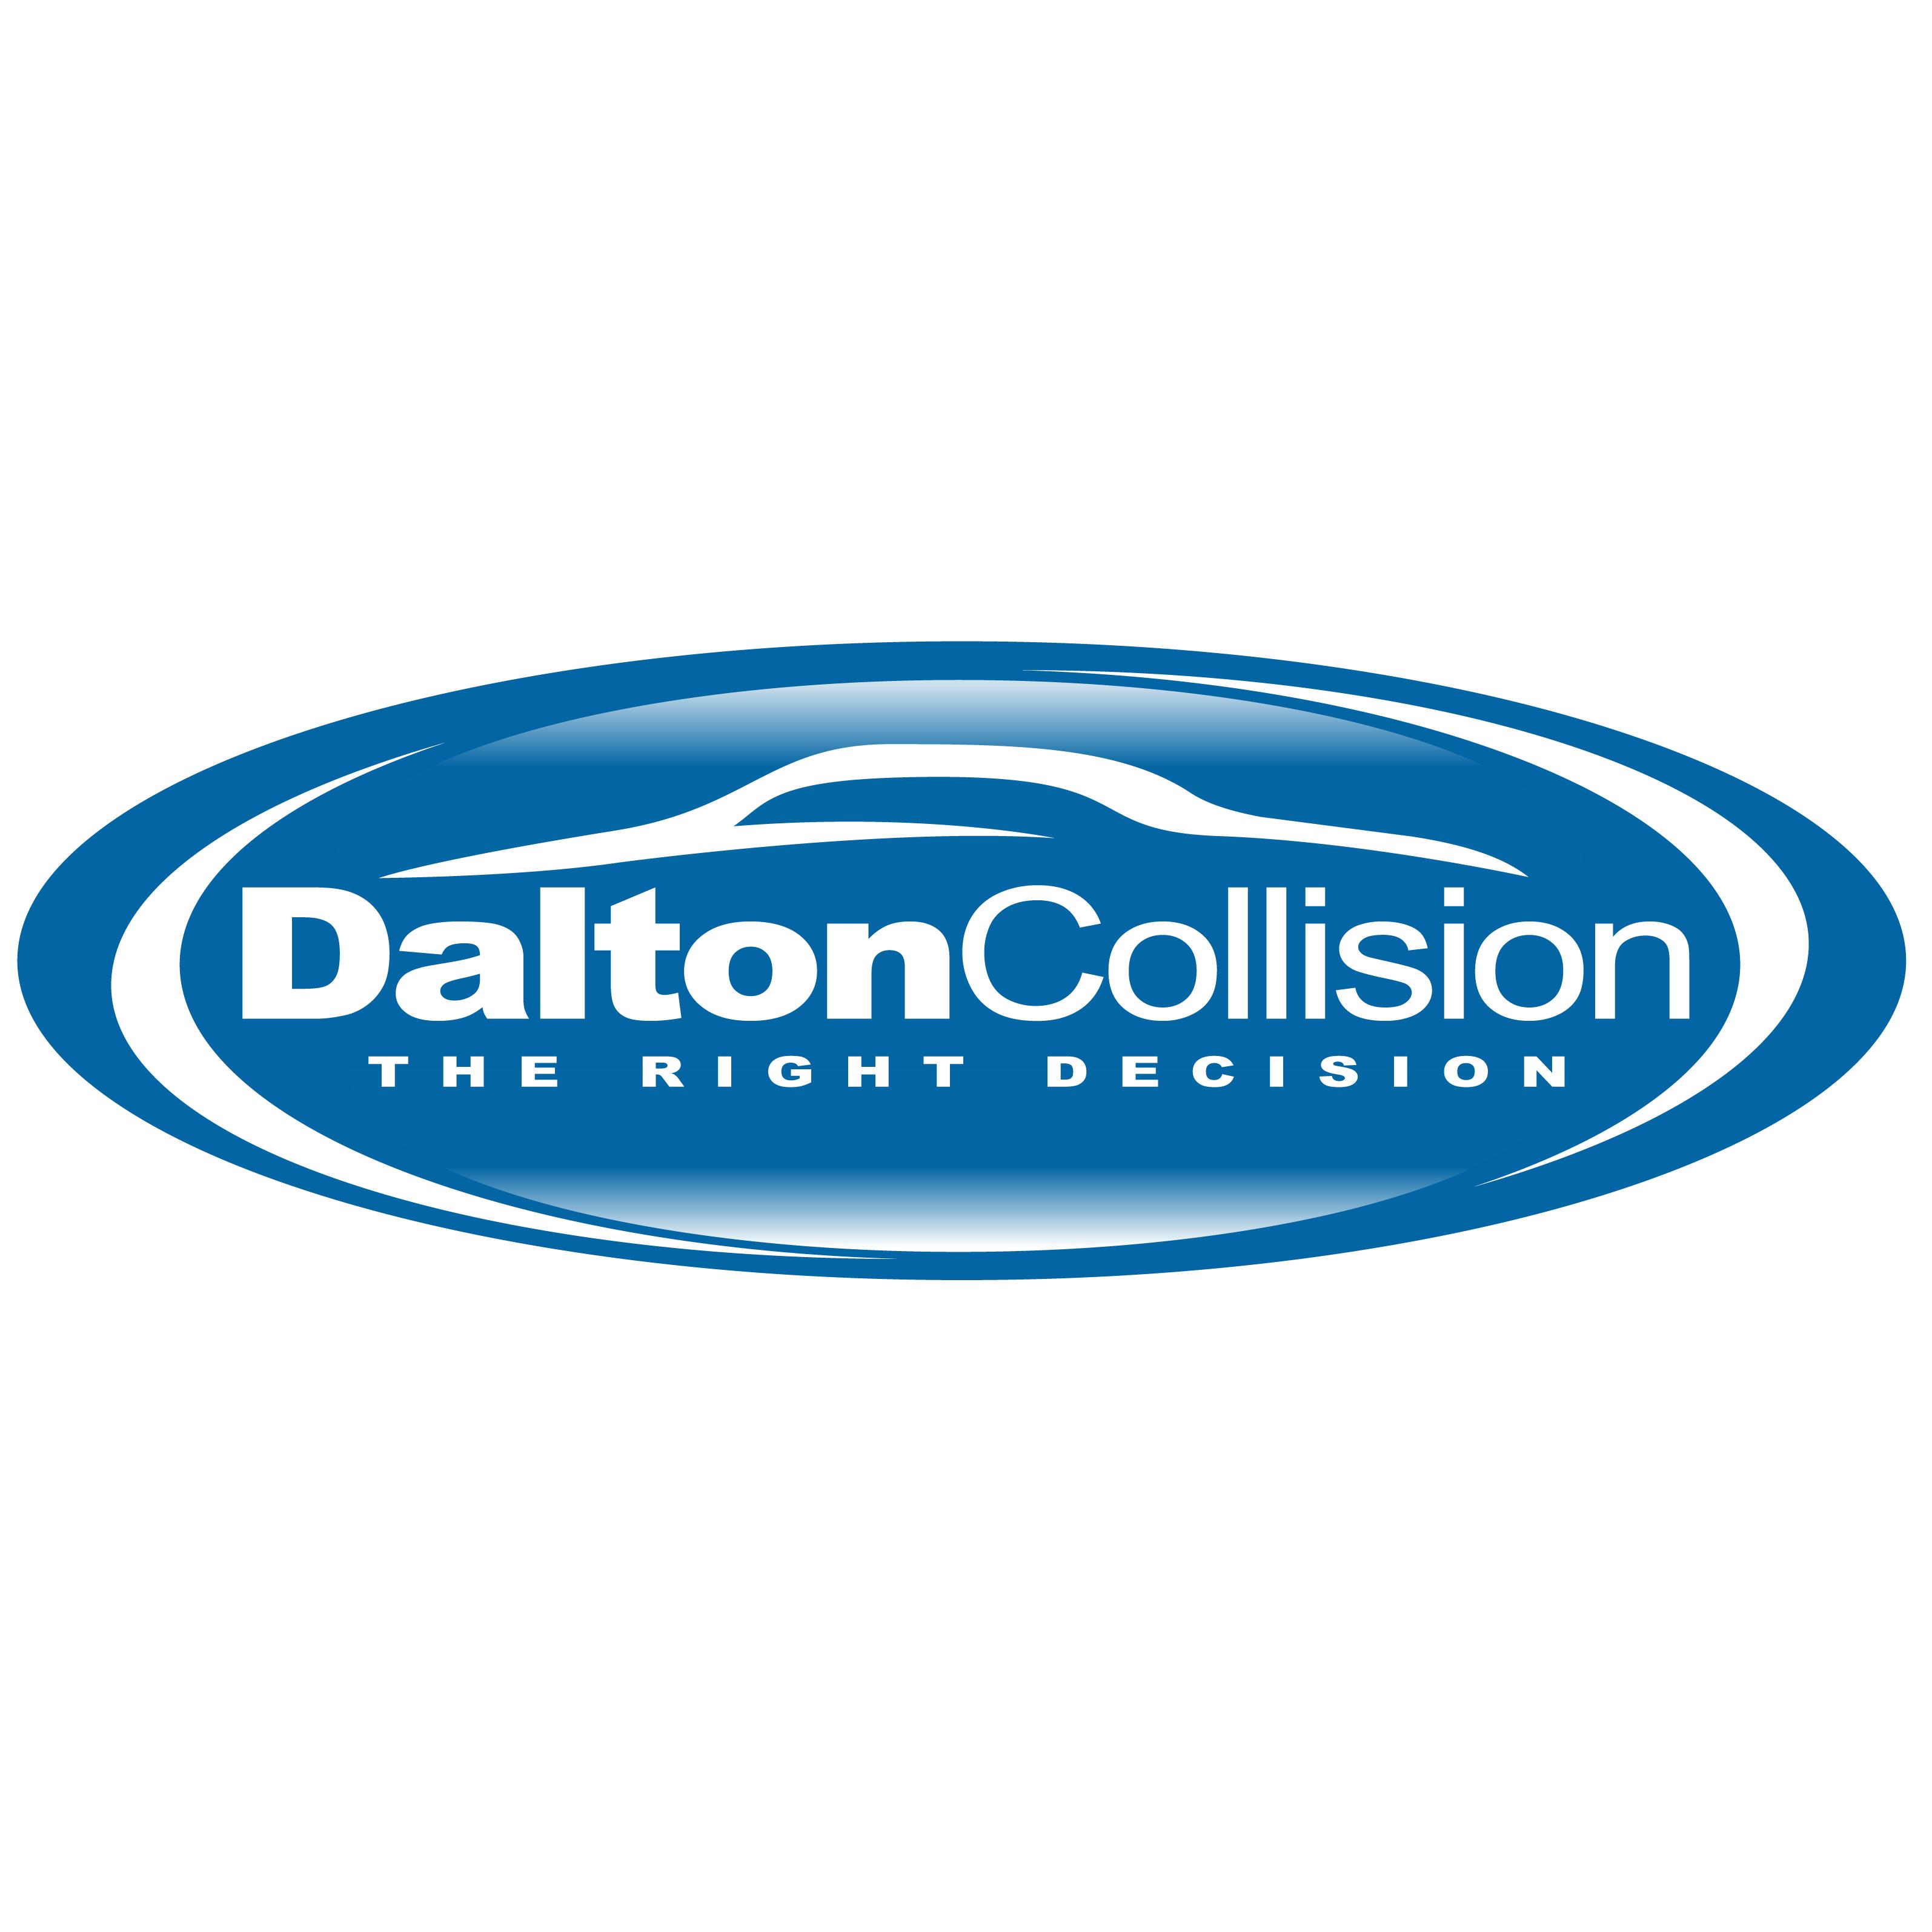 Dalton Collision Inc image 6